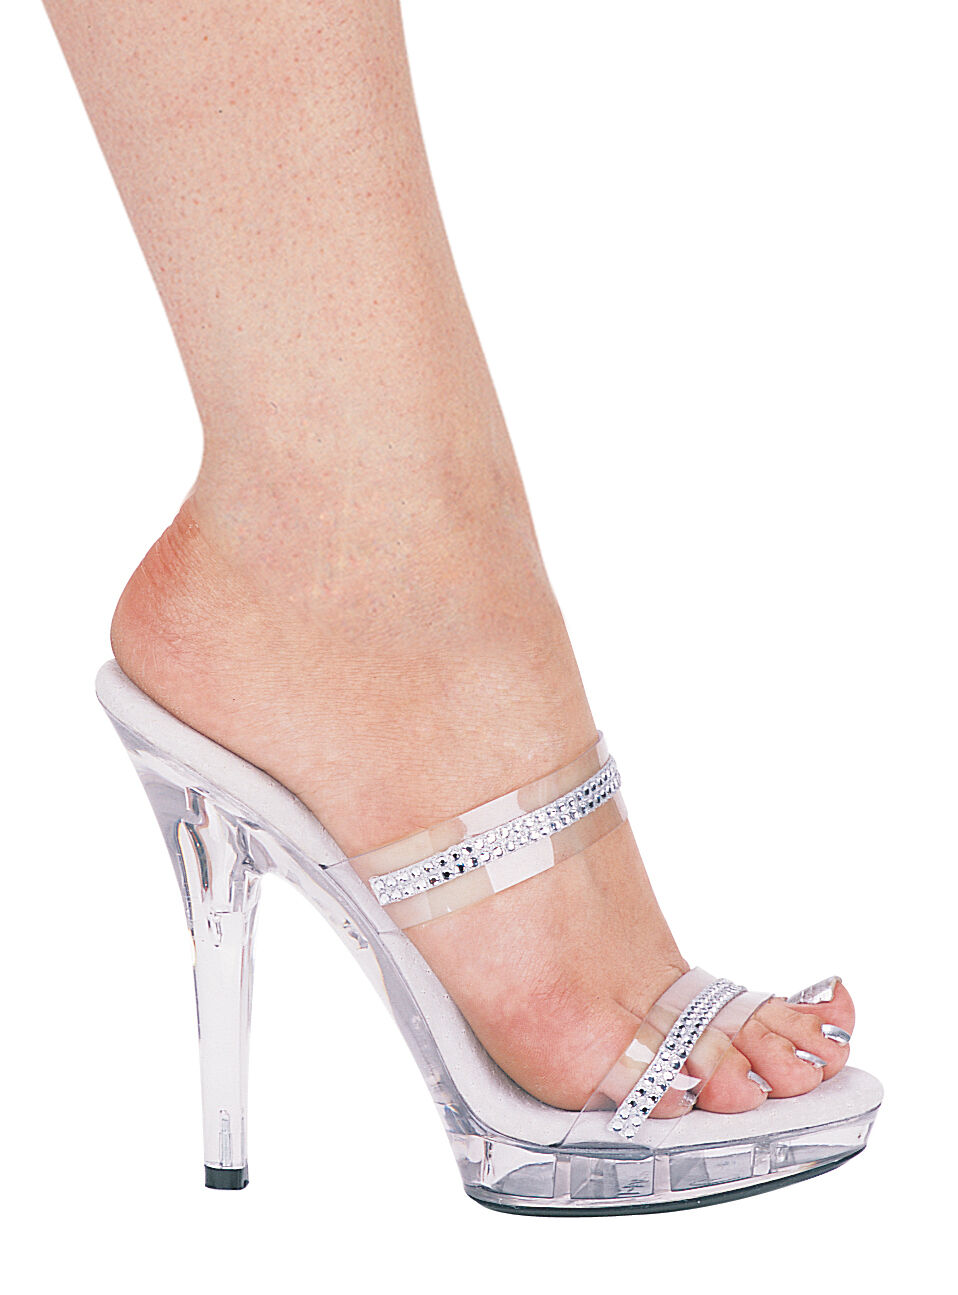 Ellie clear M-Loretta platform 5 inch high heel clear Ellie rhinestones prom pageant schuhe a057a6